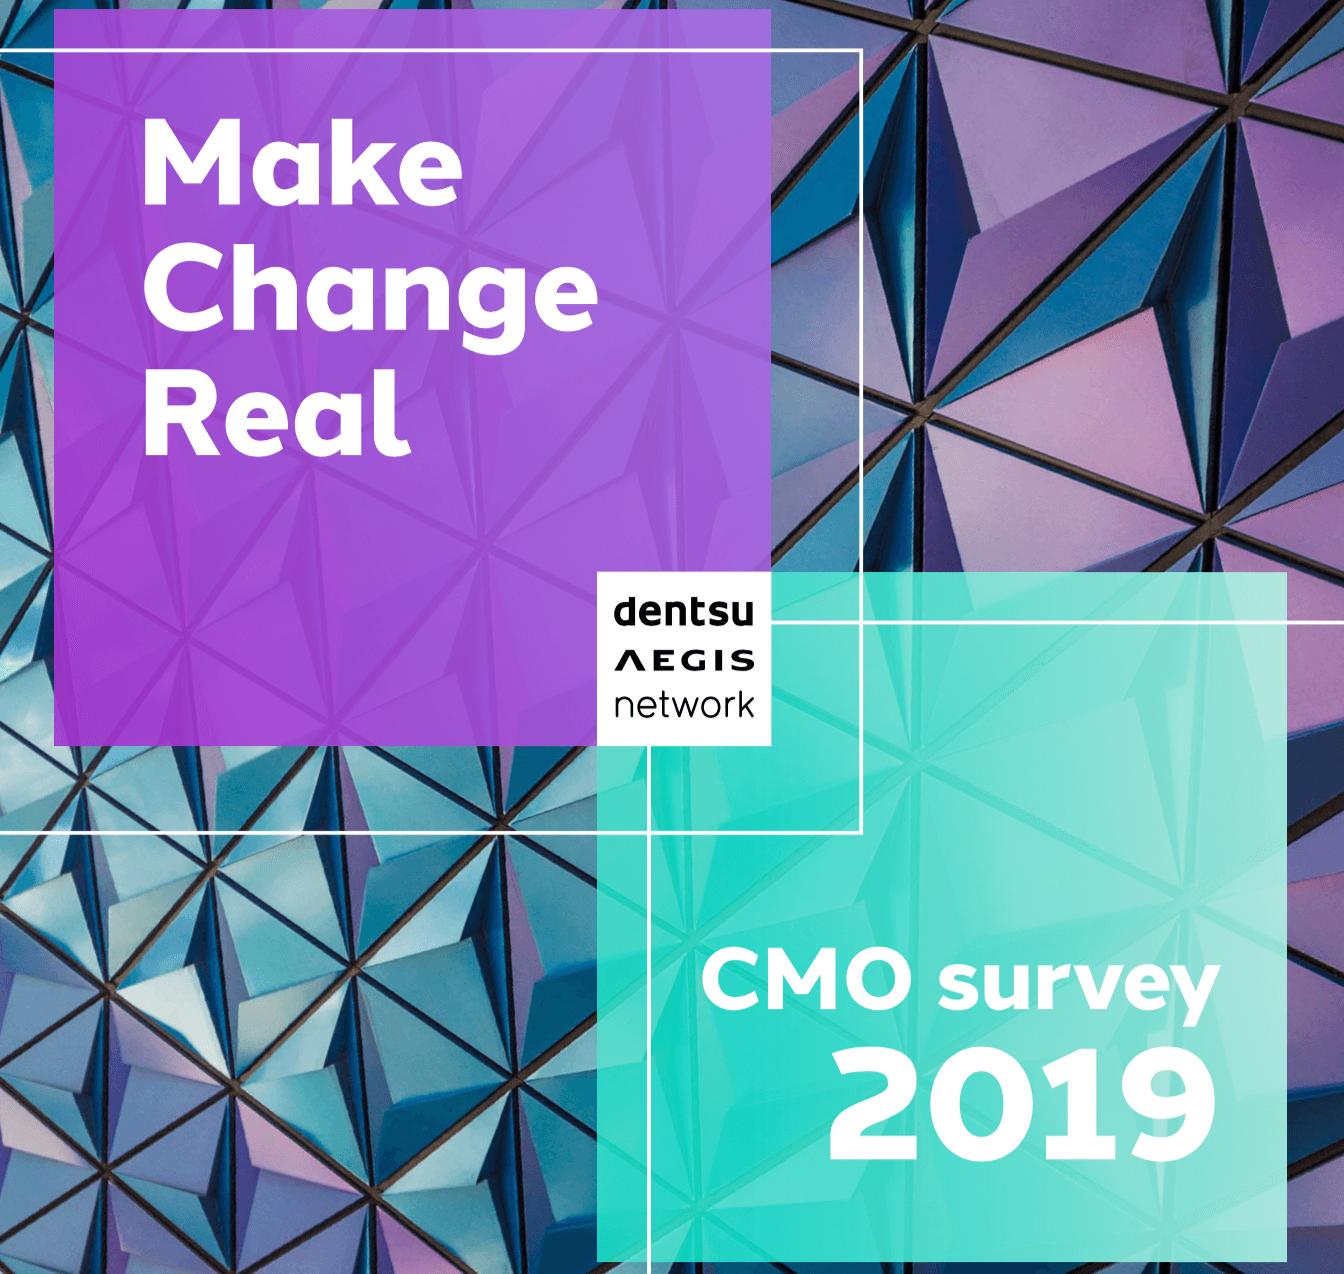 Make Change Real. Dentsu Aegis Network CMO survey 2019